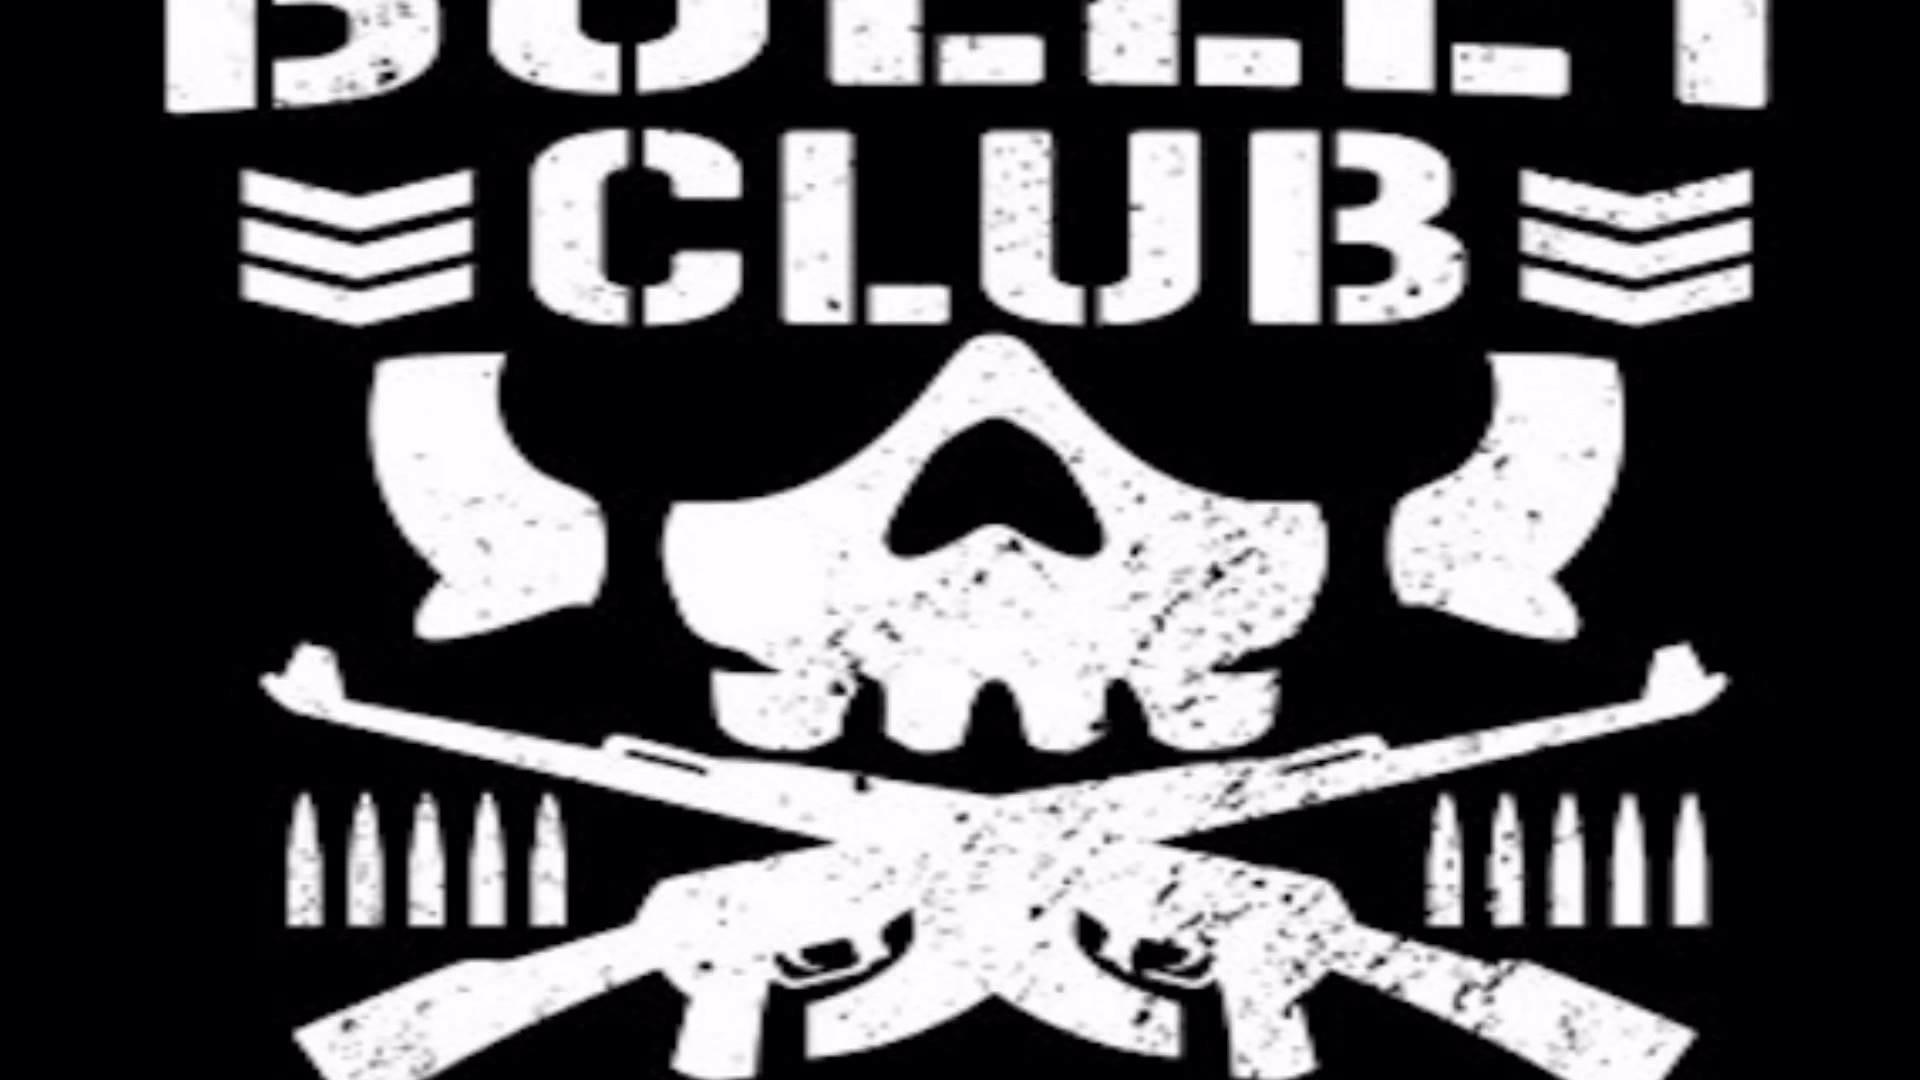 Bullet club logo clipart jpg library stock 71+ Bullet Club Wallpapers on WallpaperPlay jpg library stock